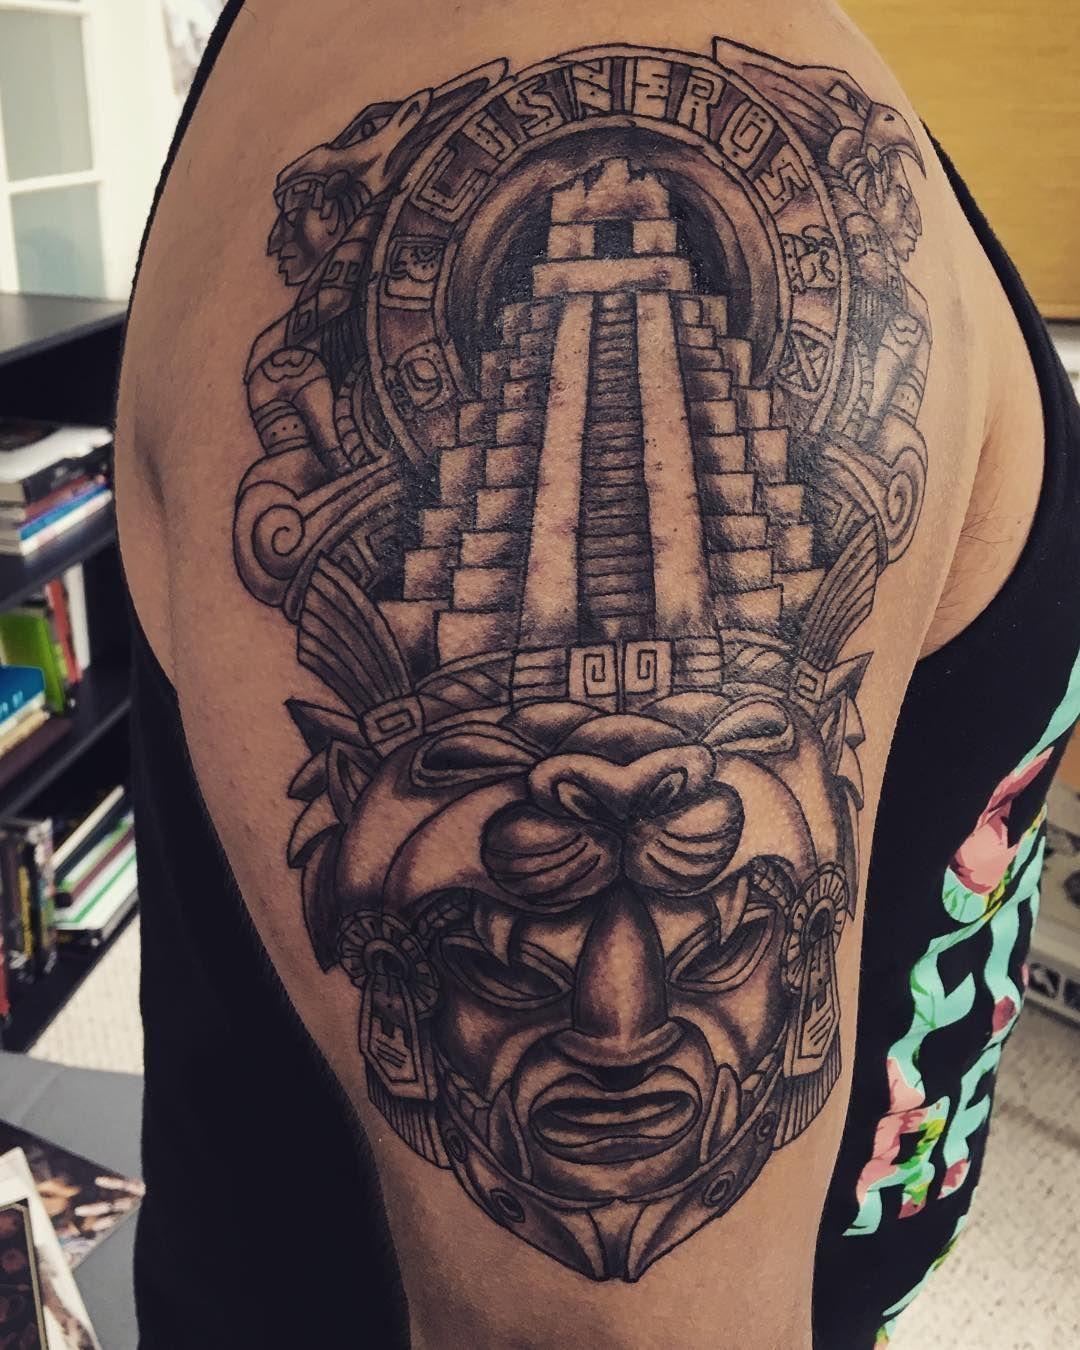 Mysterious Tribal Tattoos On Media Democracy Tattoos Ideas Media